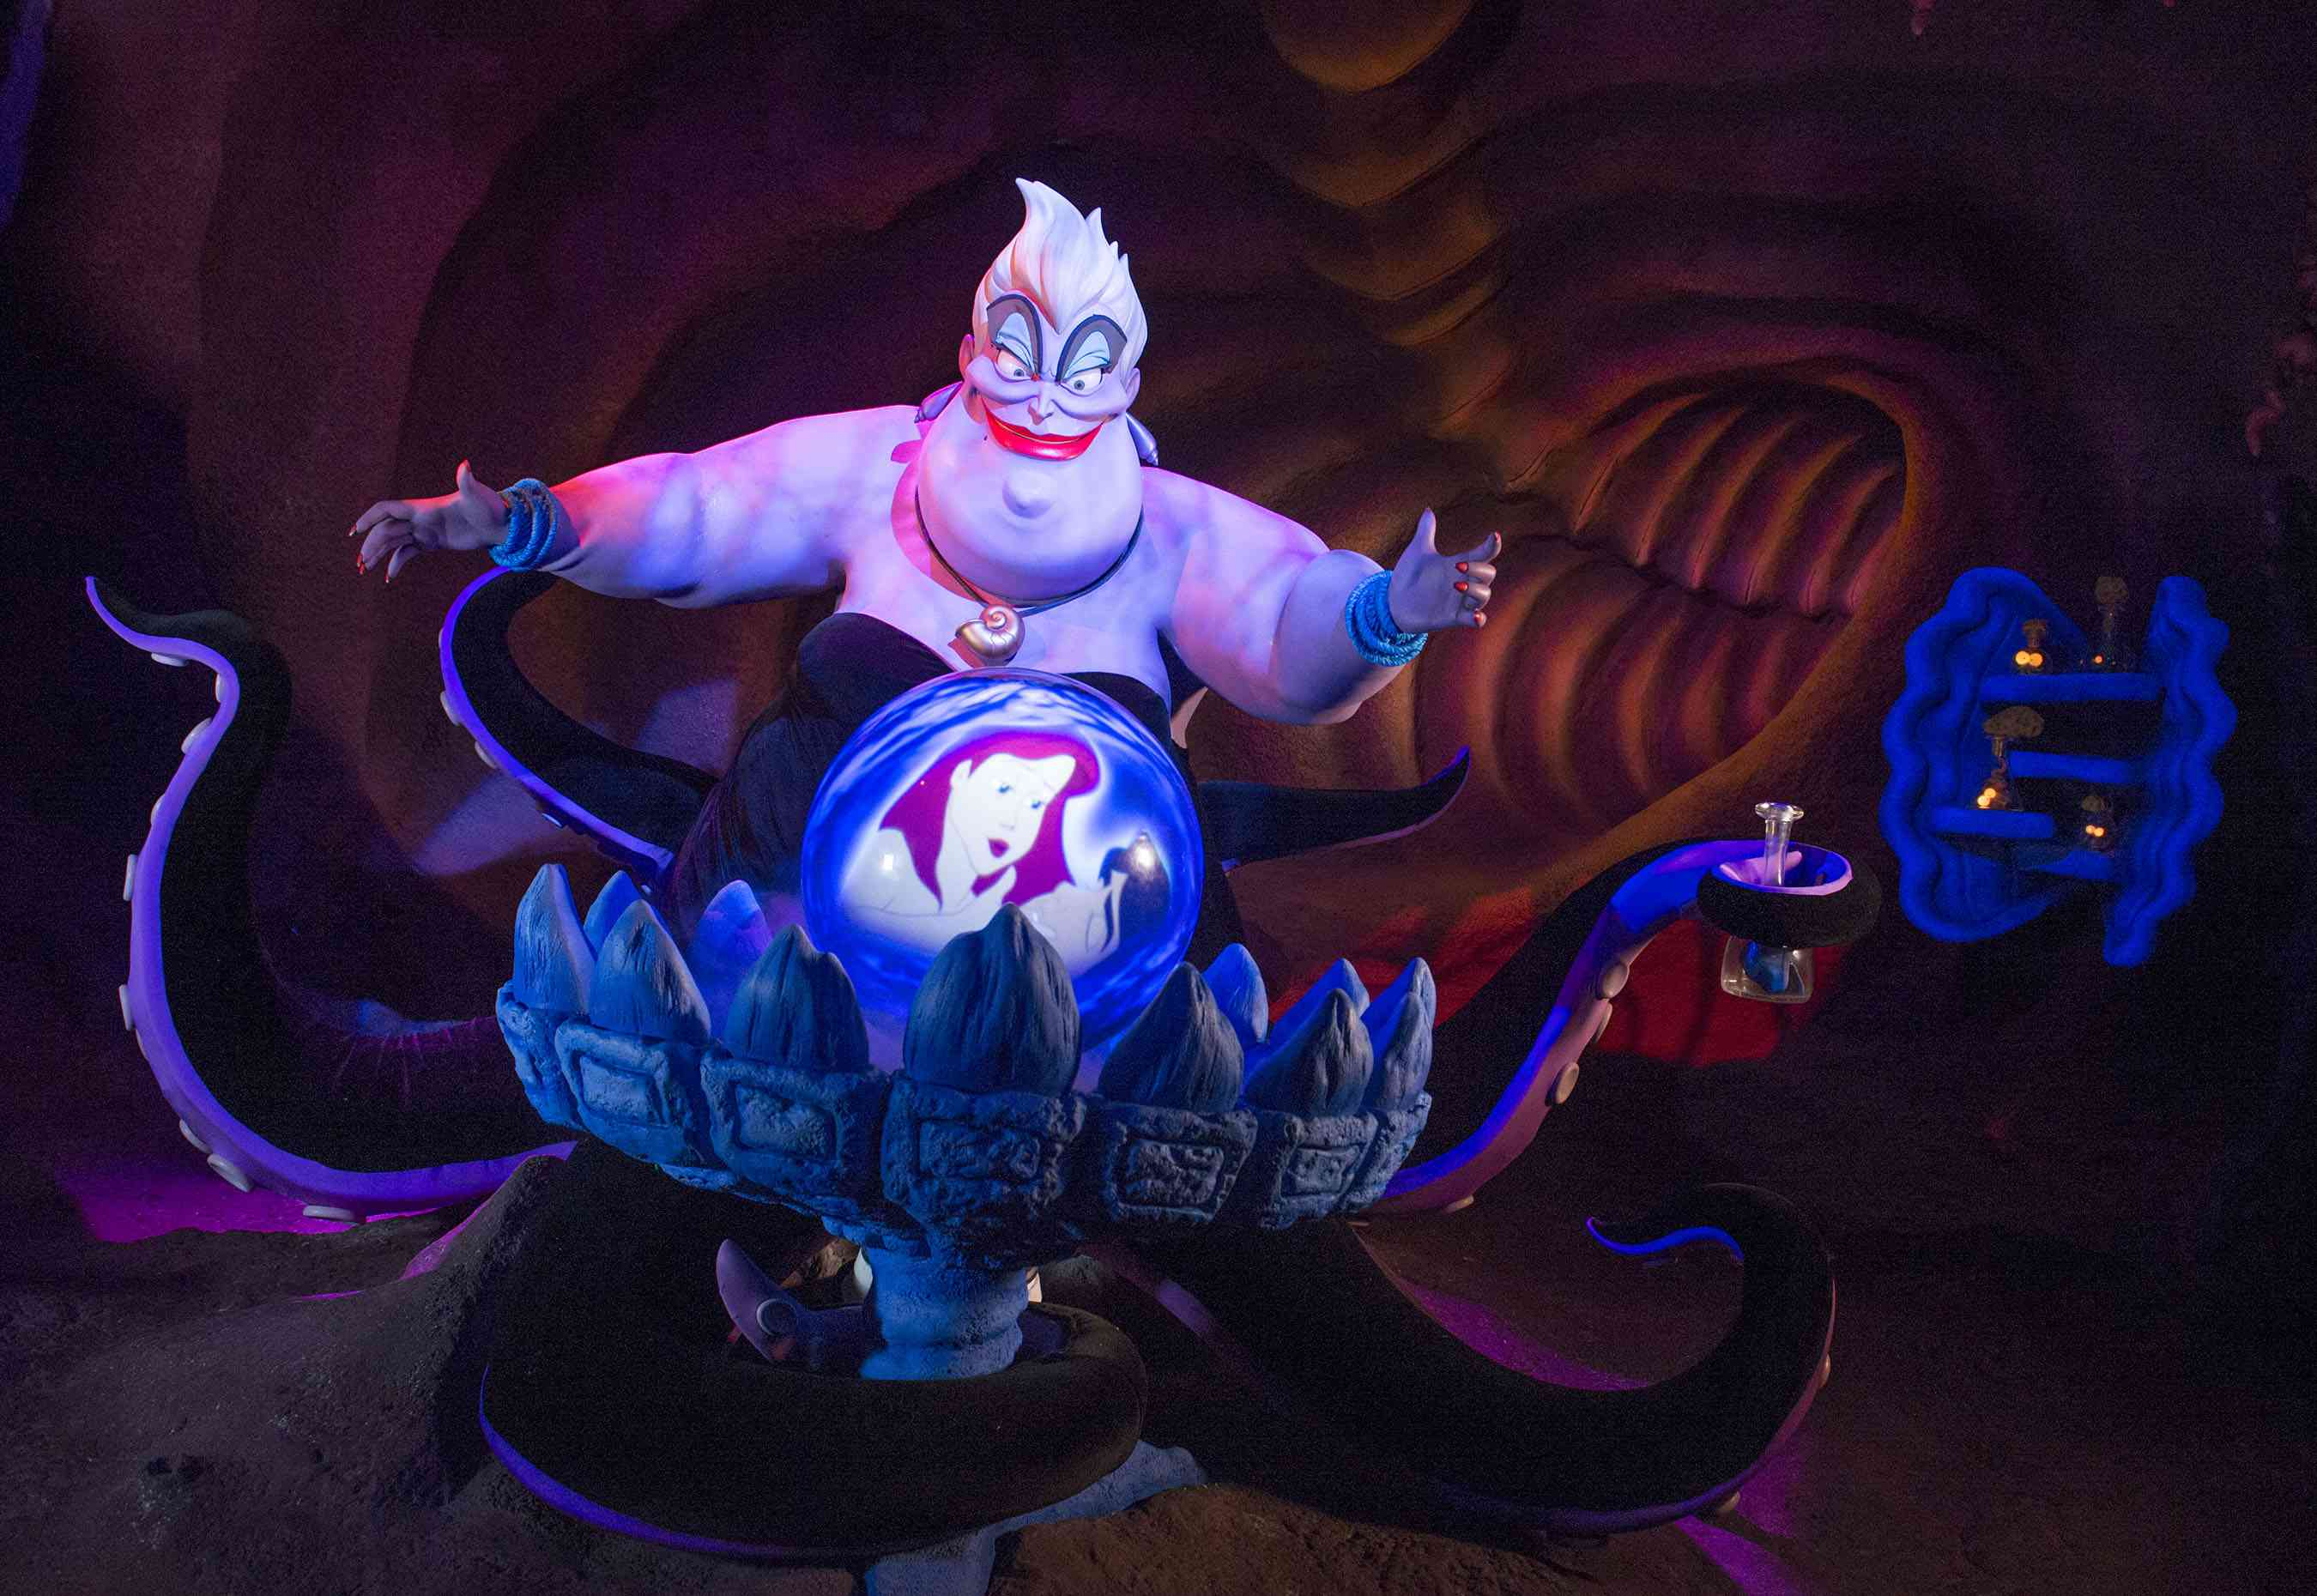 Ursula figure in Little Mermaid ride